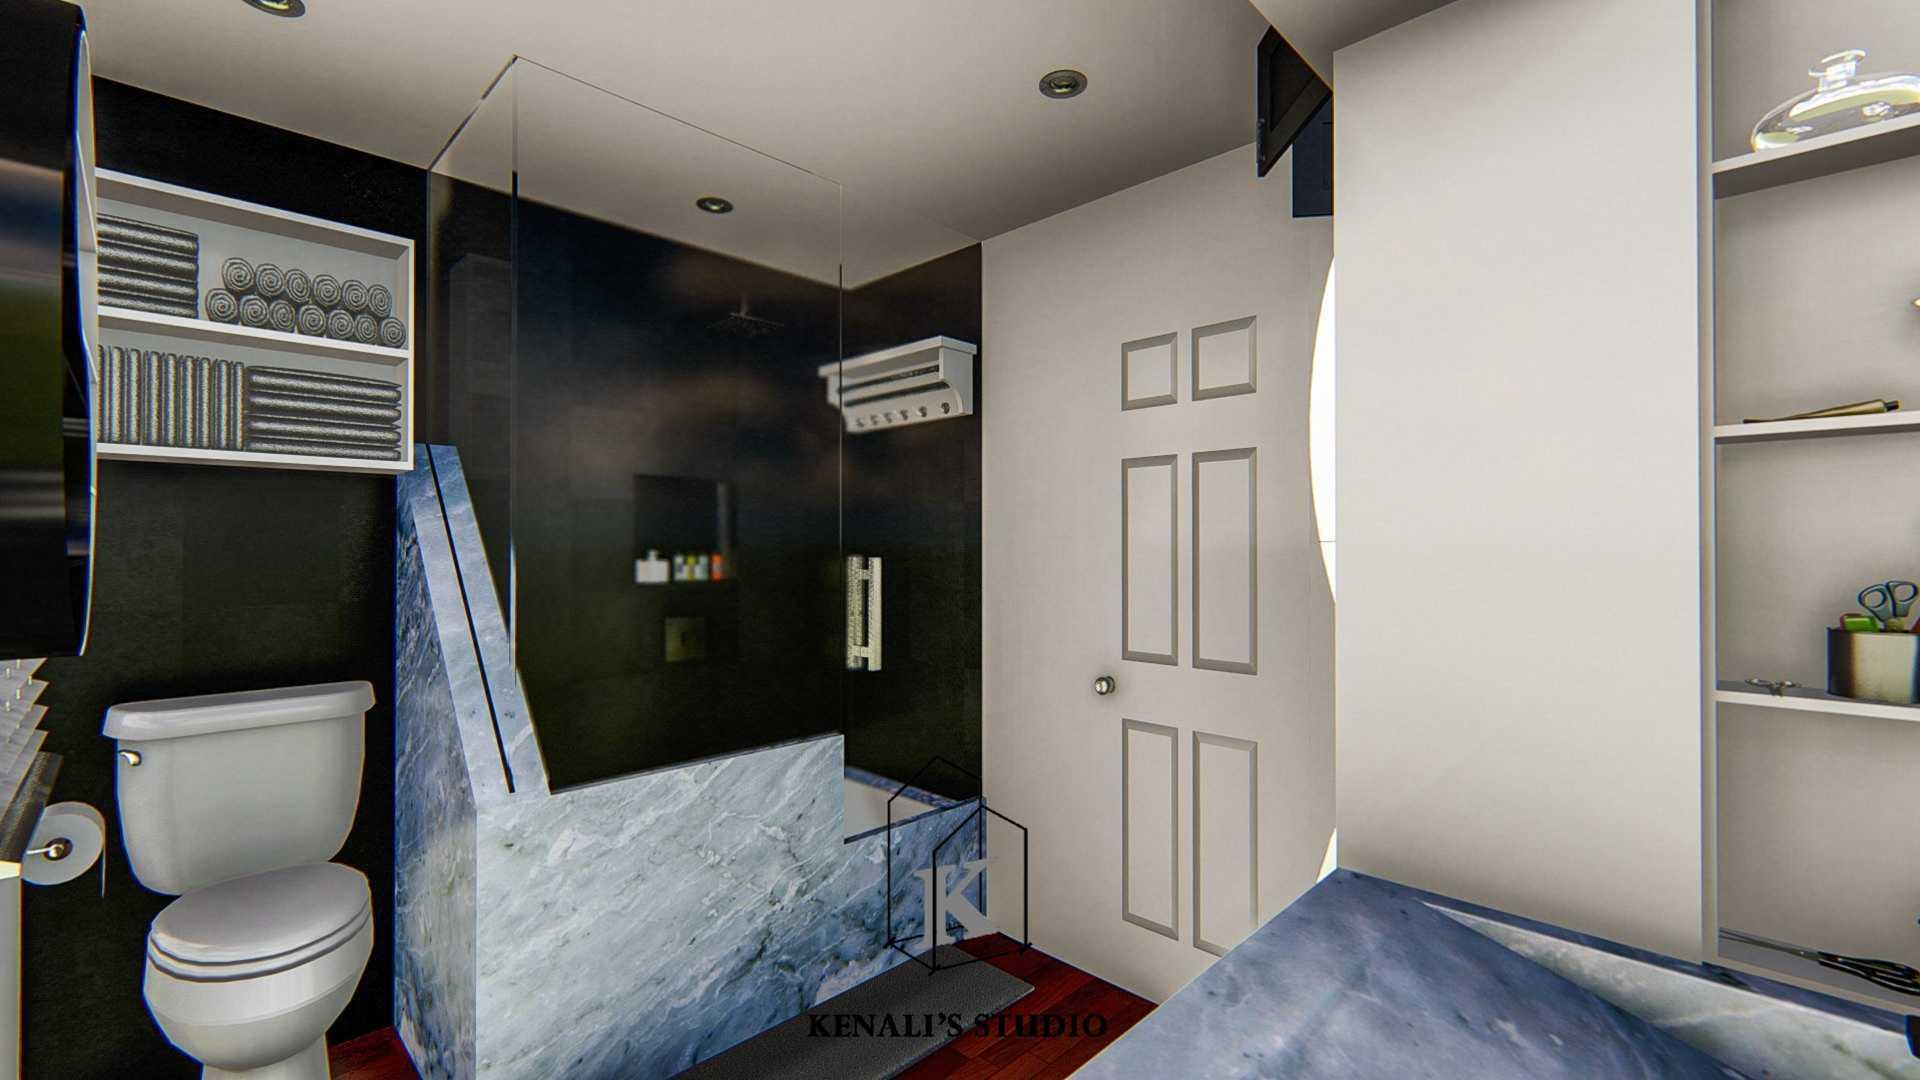 Kenali's Studio Project : Laundry & Bathroom Amerika Serikat Amerika Serikat Kenalis-Studio-Project-Laundry-Bathroom  72919